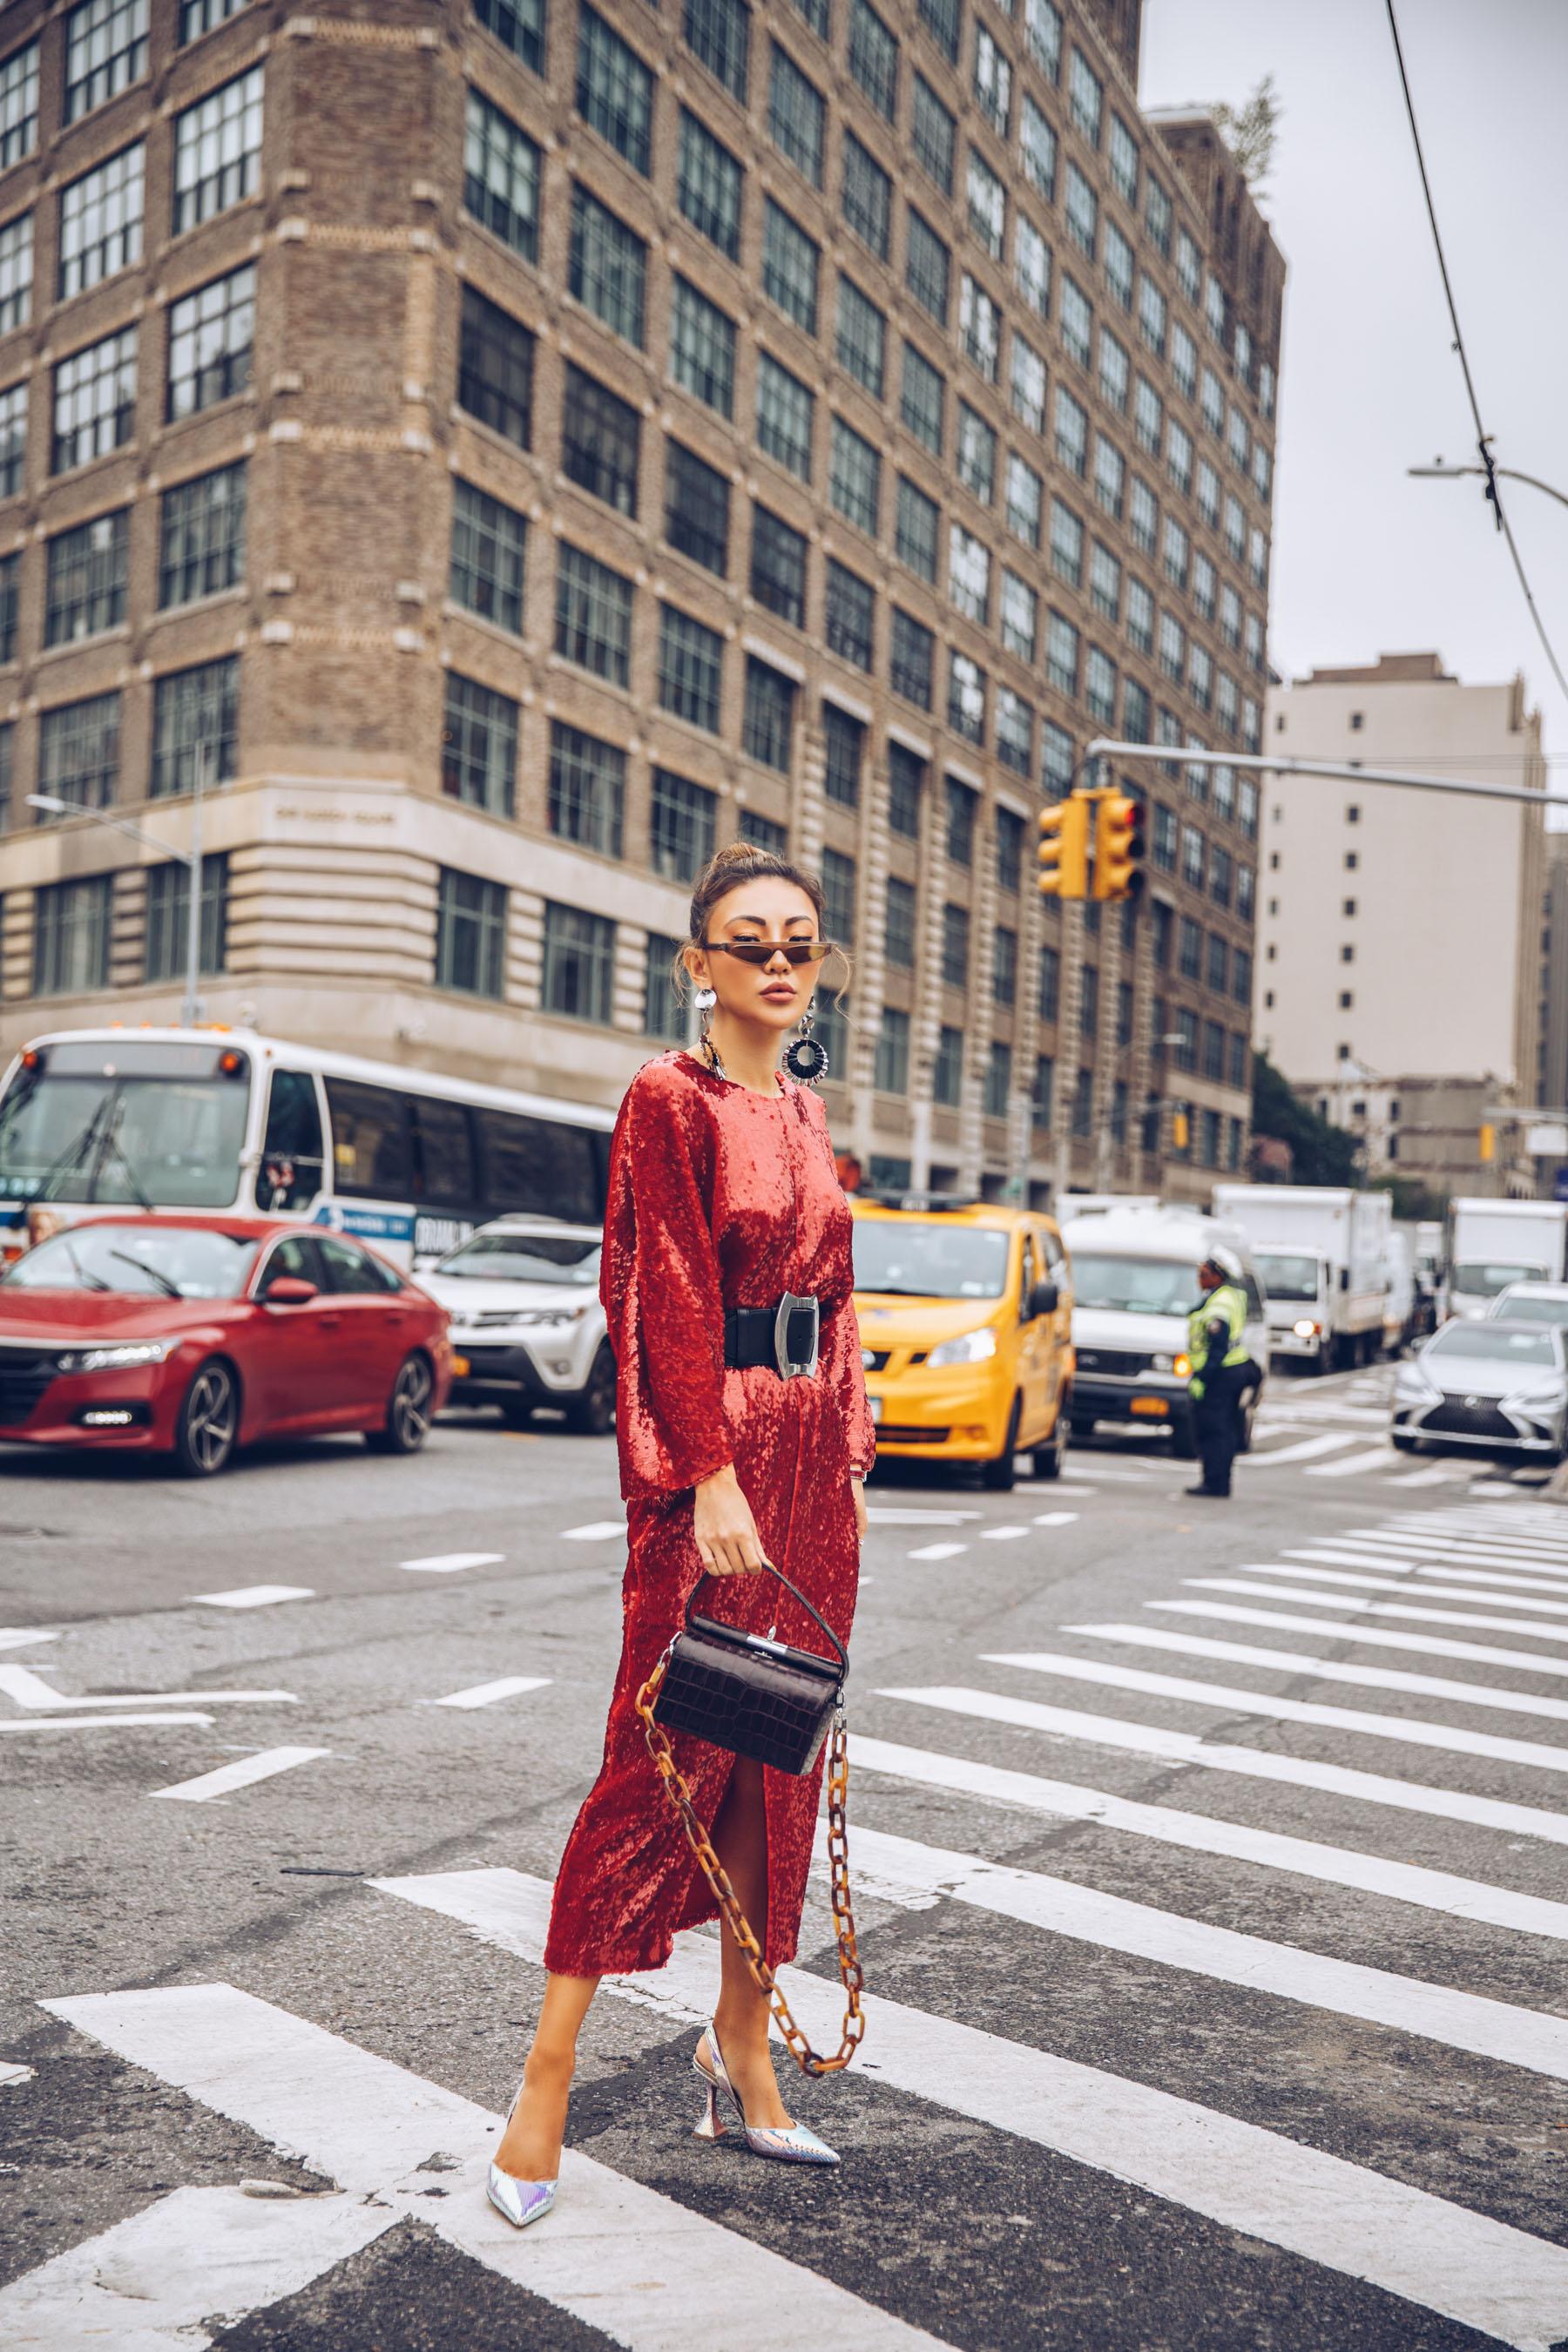 NYFW SS19 Recap, NYFW SS19 Street Style, holographic trend, metallic trend // Notjessfashion.com